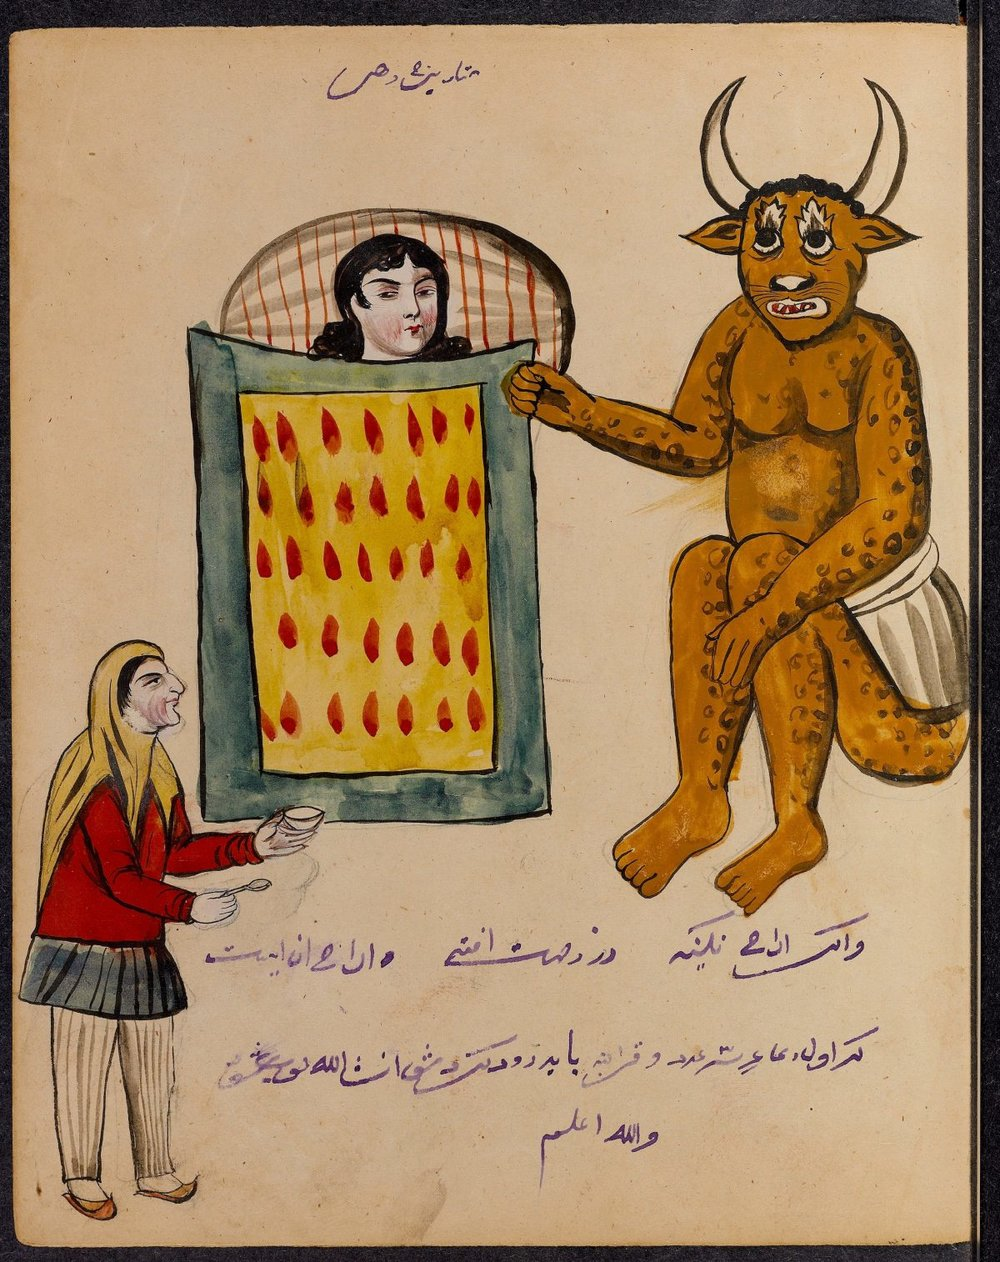 Demons-iran-9-1200x1514.jpg